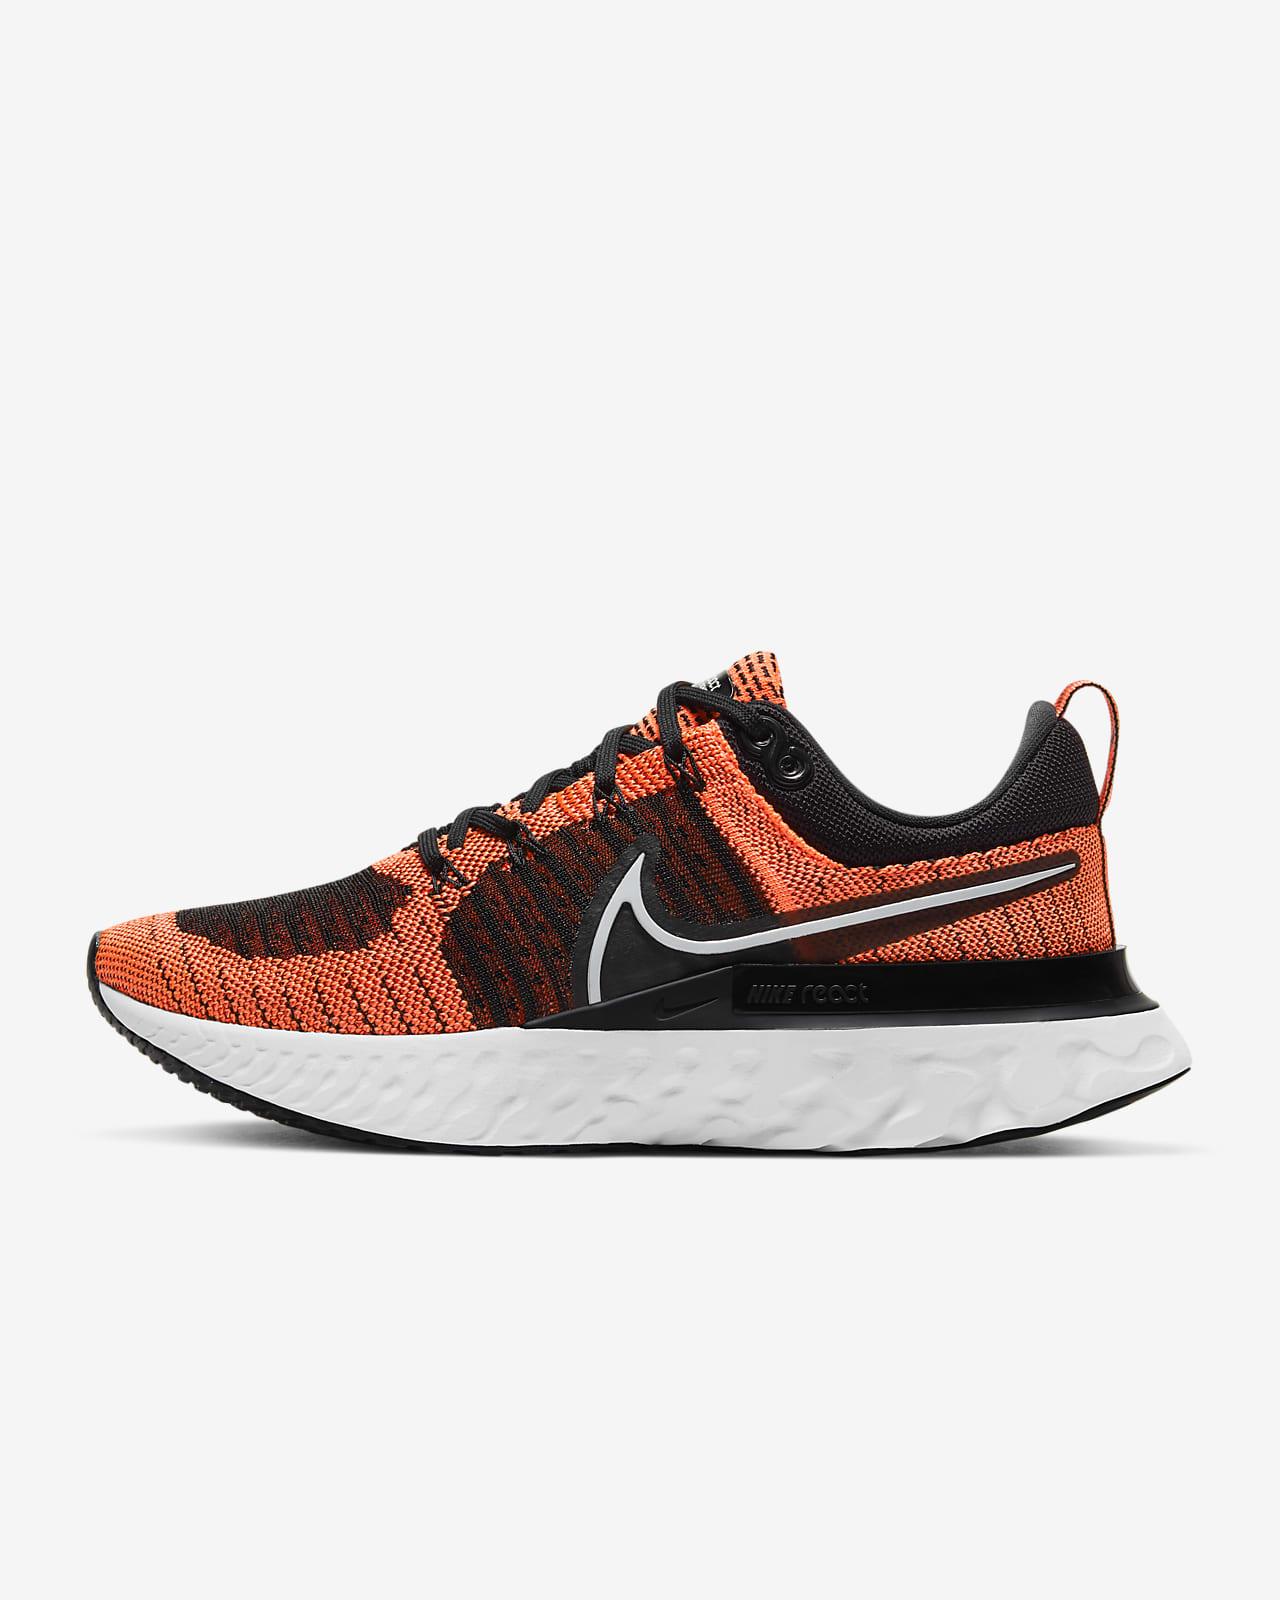 Nike React Infinity Run Flyknit 2 Zapatillas de running - Mujer